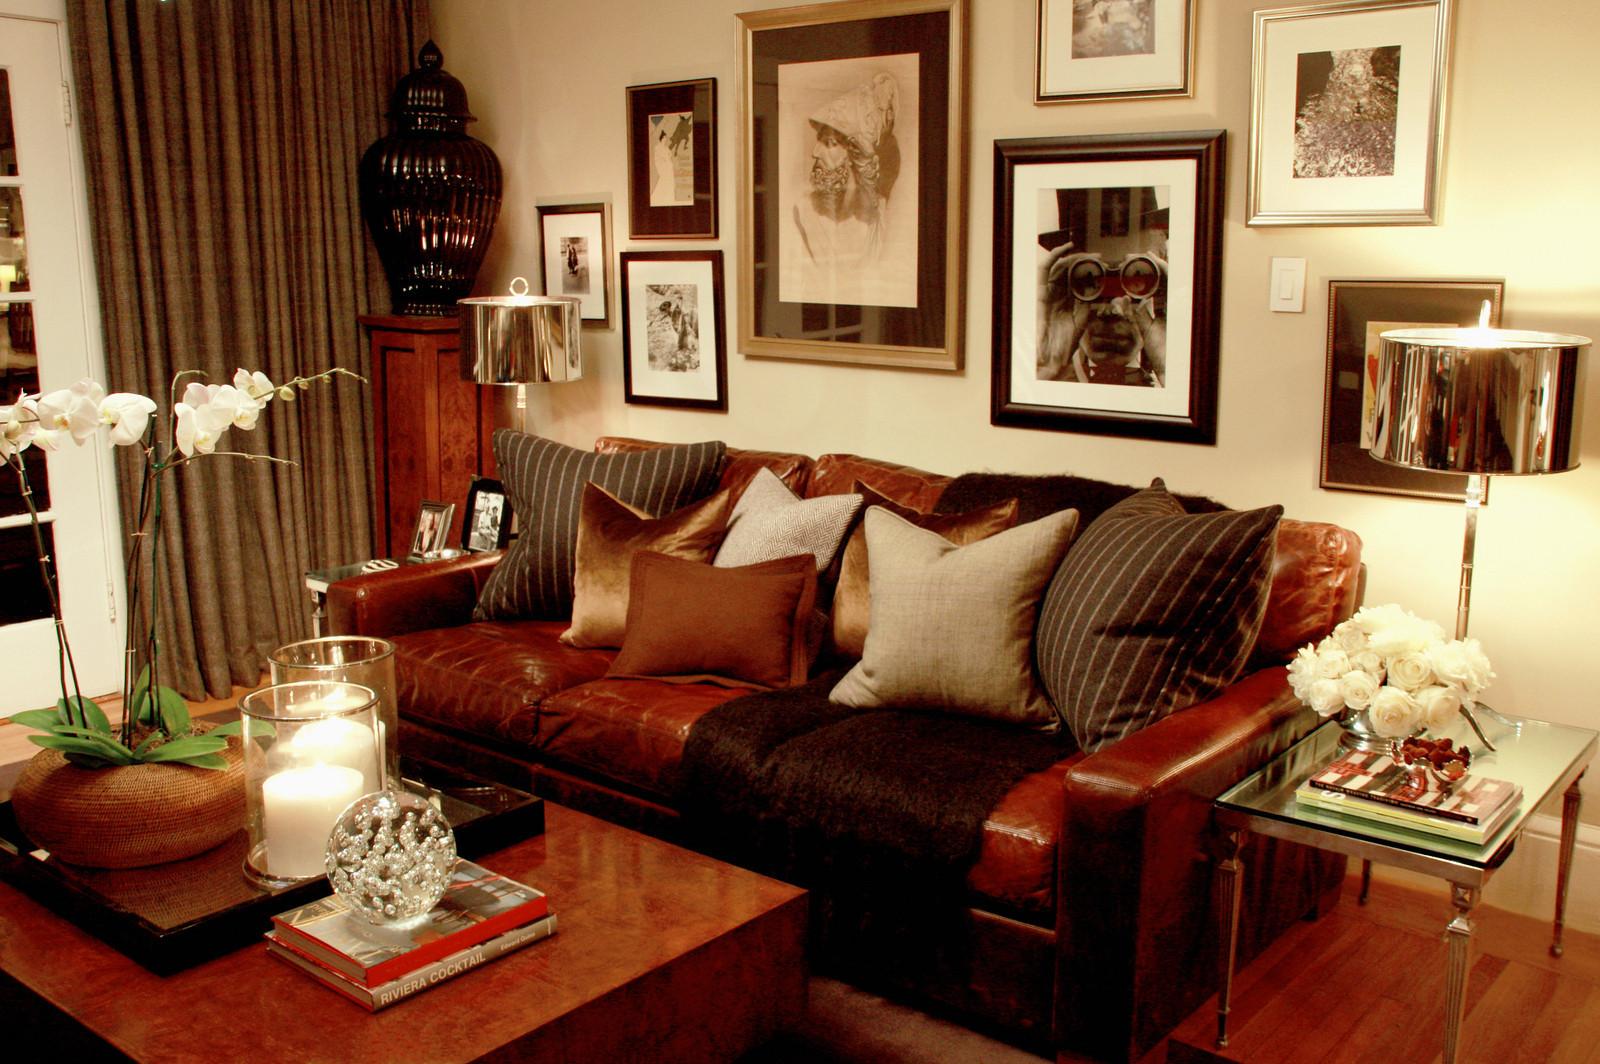 Scot Meacham Wood Design - Presidio Heights Living Room 1.jpg